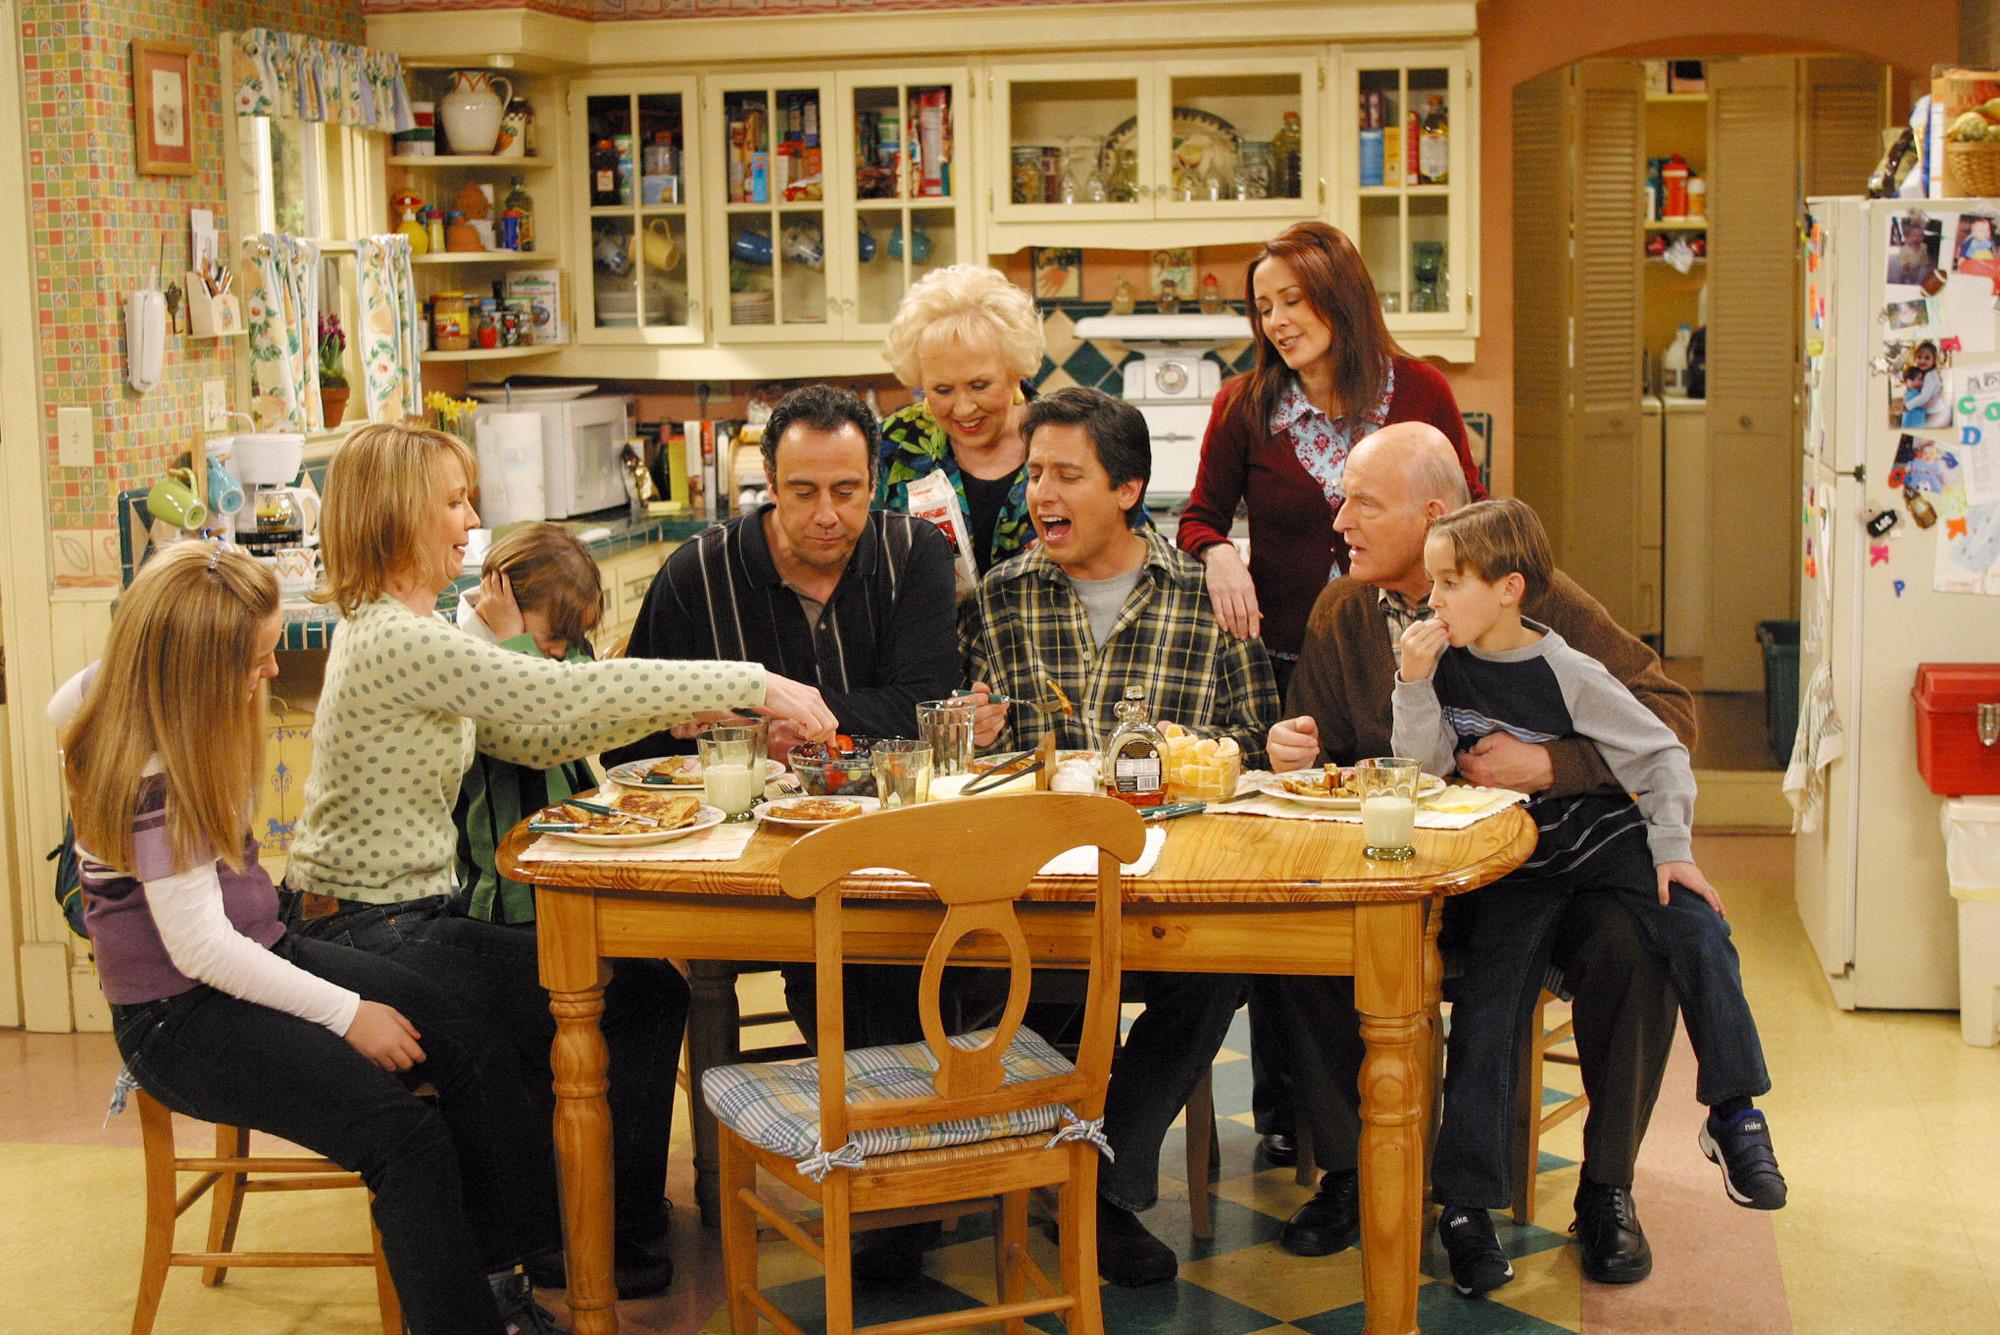 A scene from the CBS comedy 'Everybody Loves Raymond'